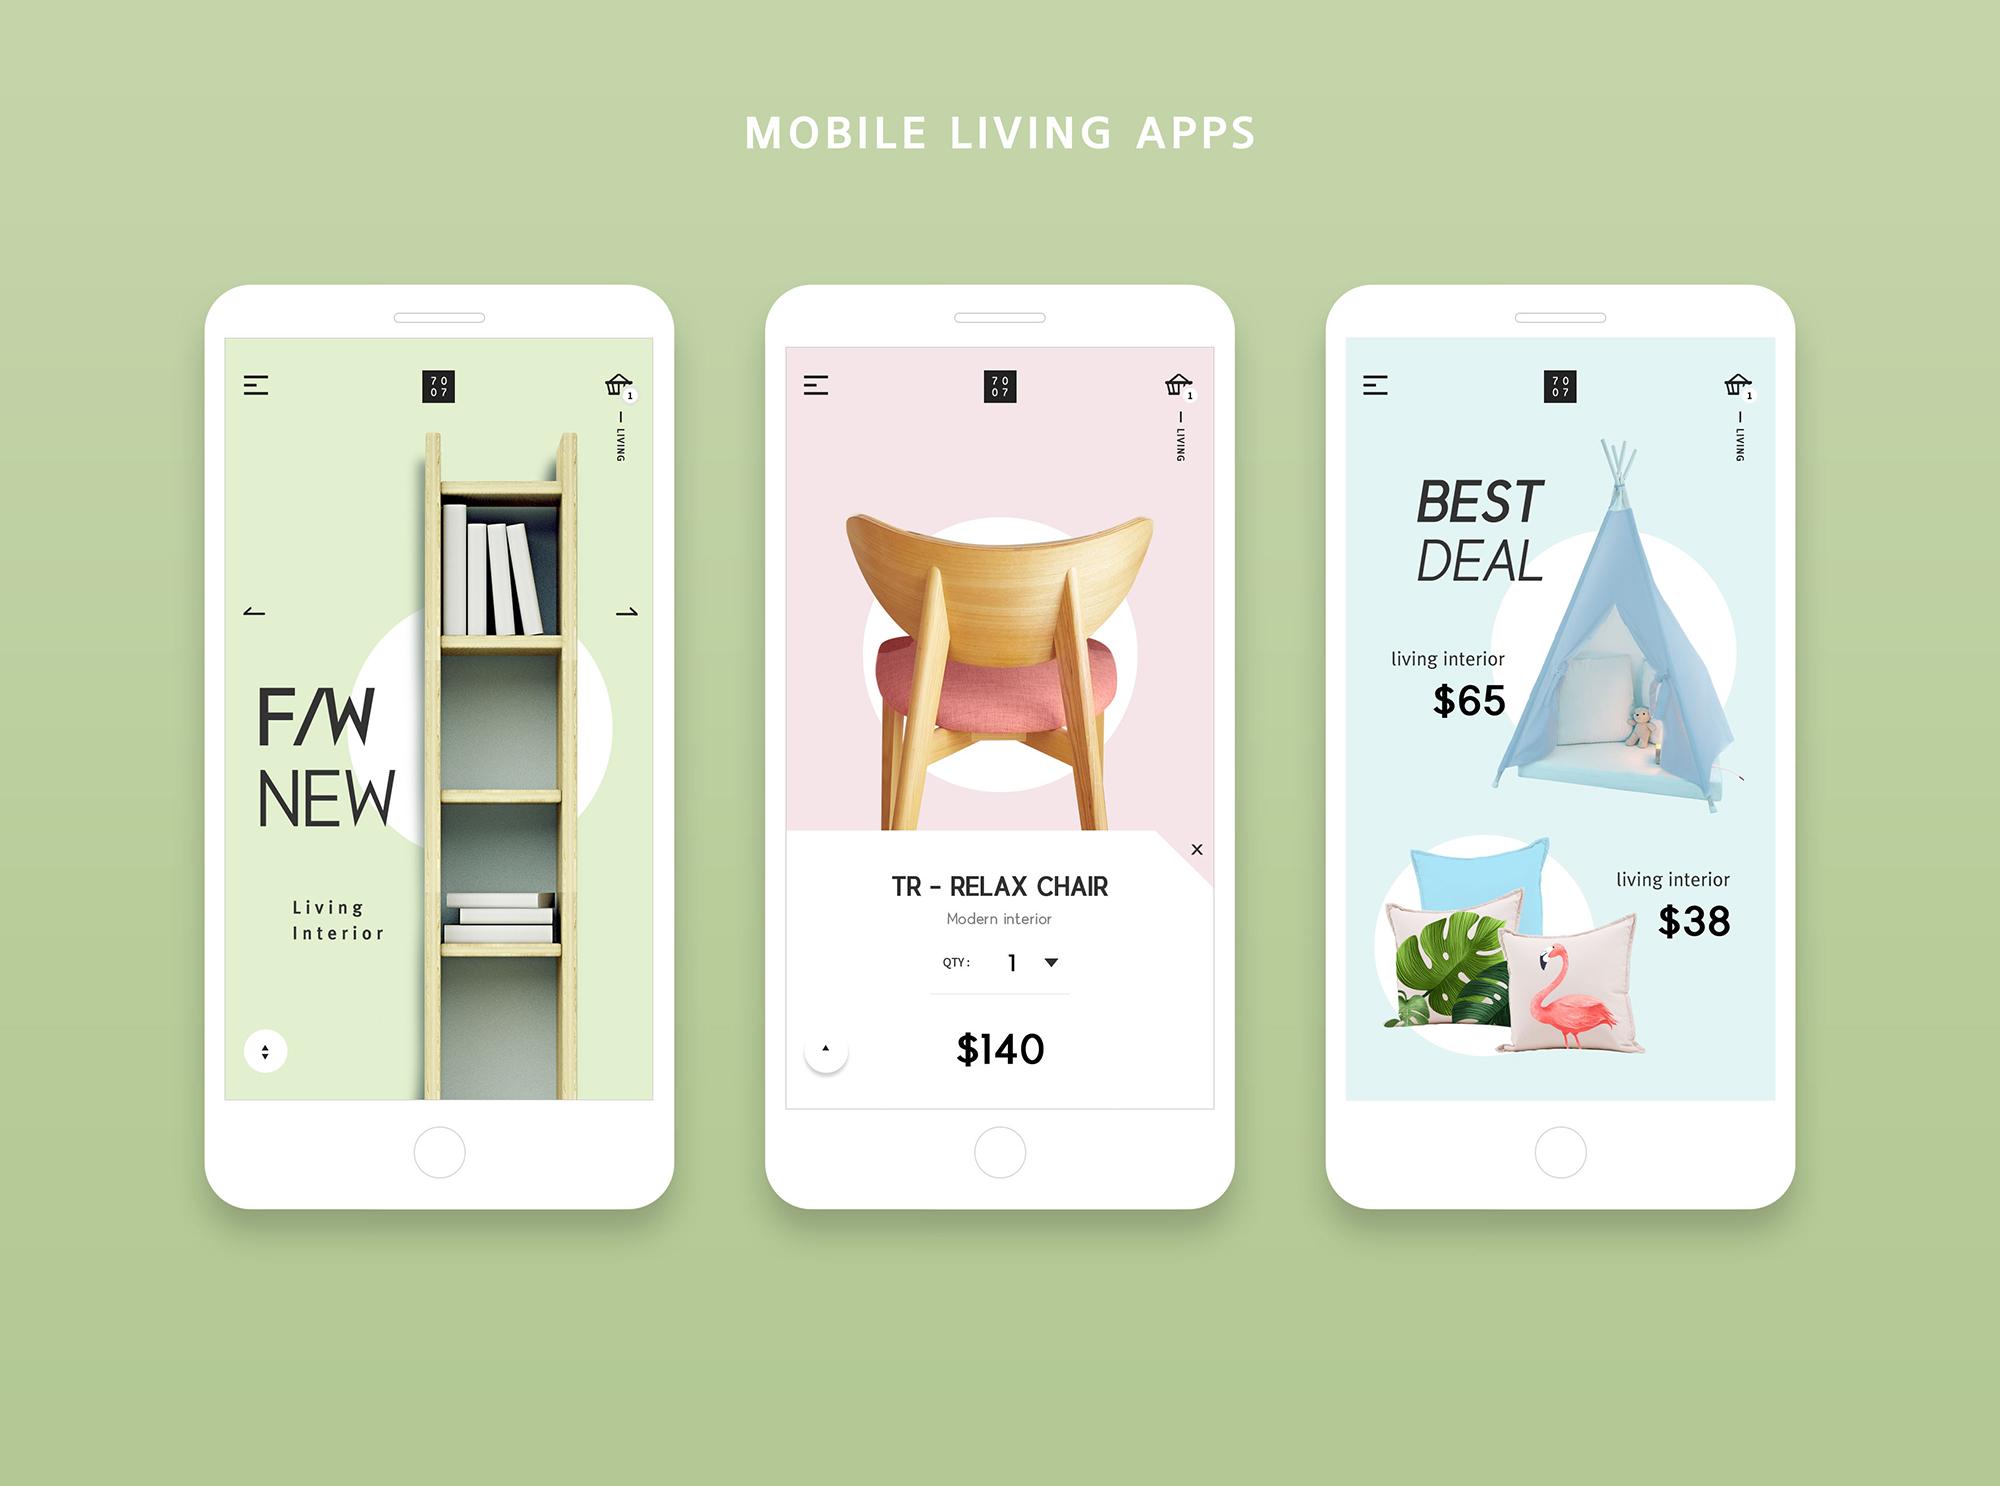 简约风UI Home Mobile Living App-设计石代